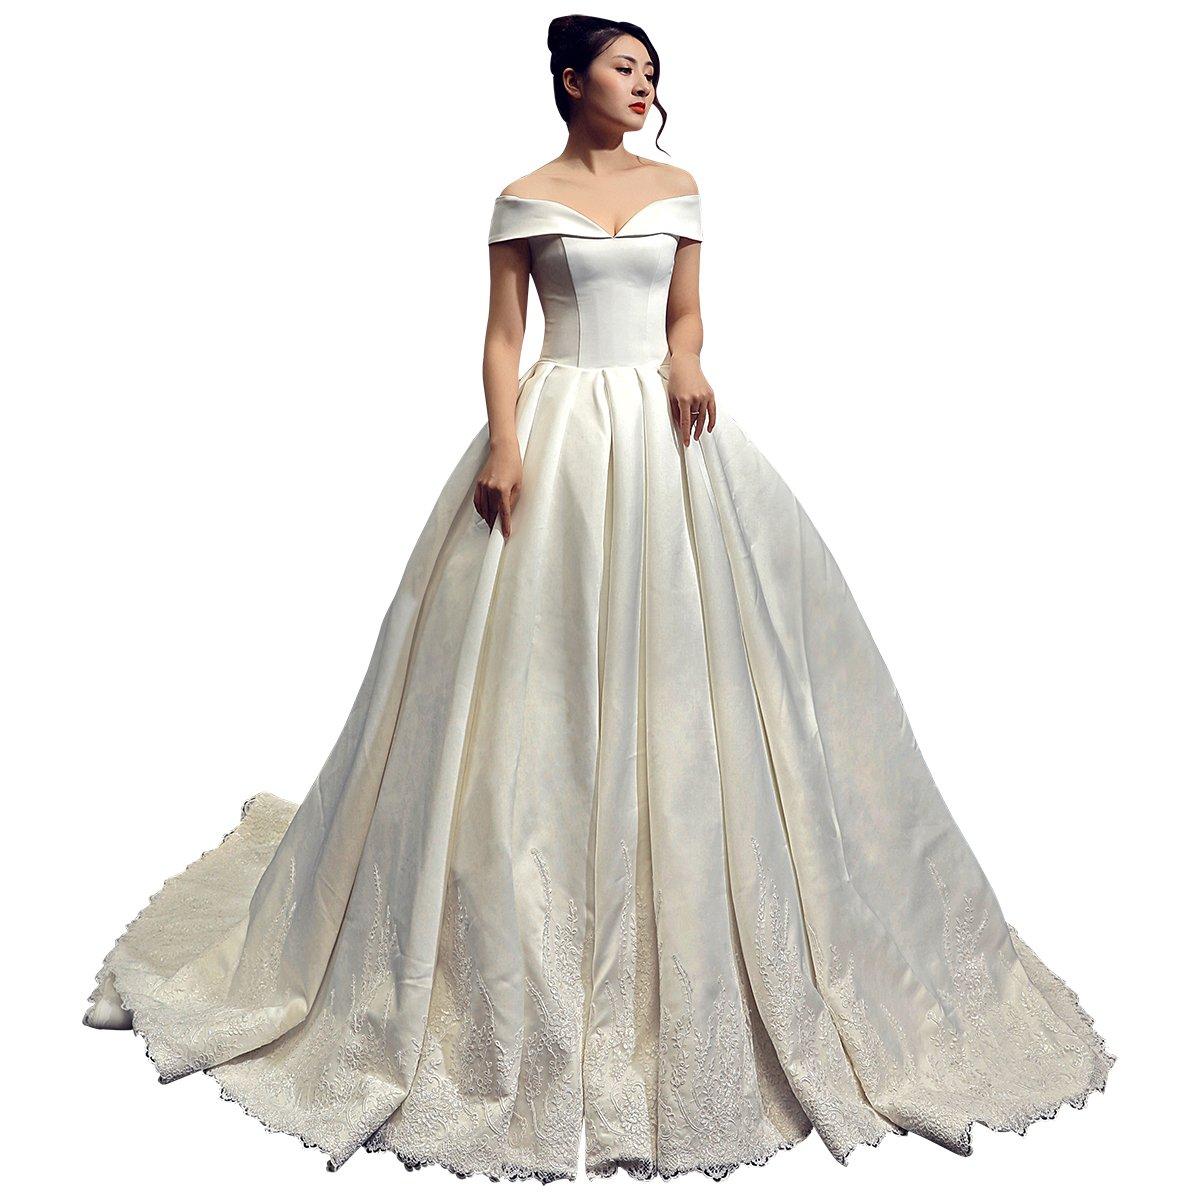 Erosebridal Retro Style Ball Gowns Wedding Dress Long Train